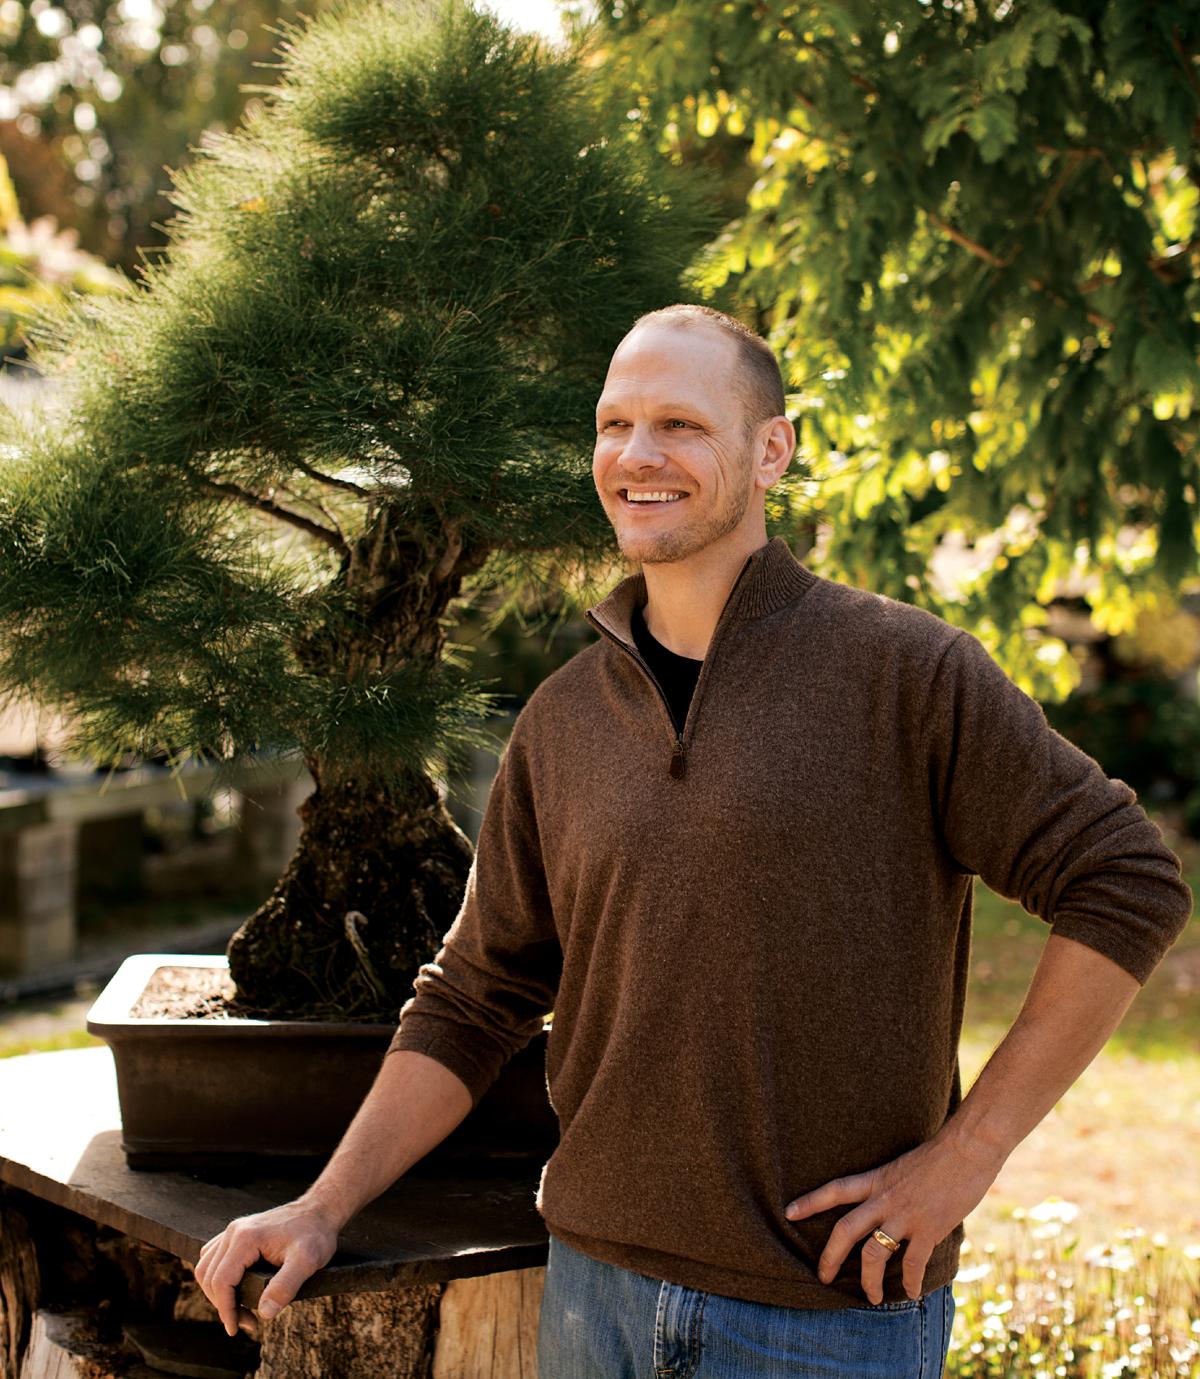 jacob-kulin-boston-artist-bonsai